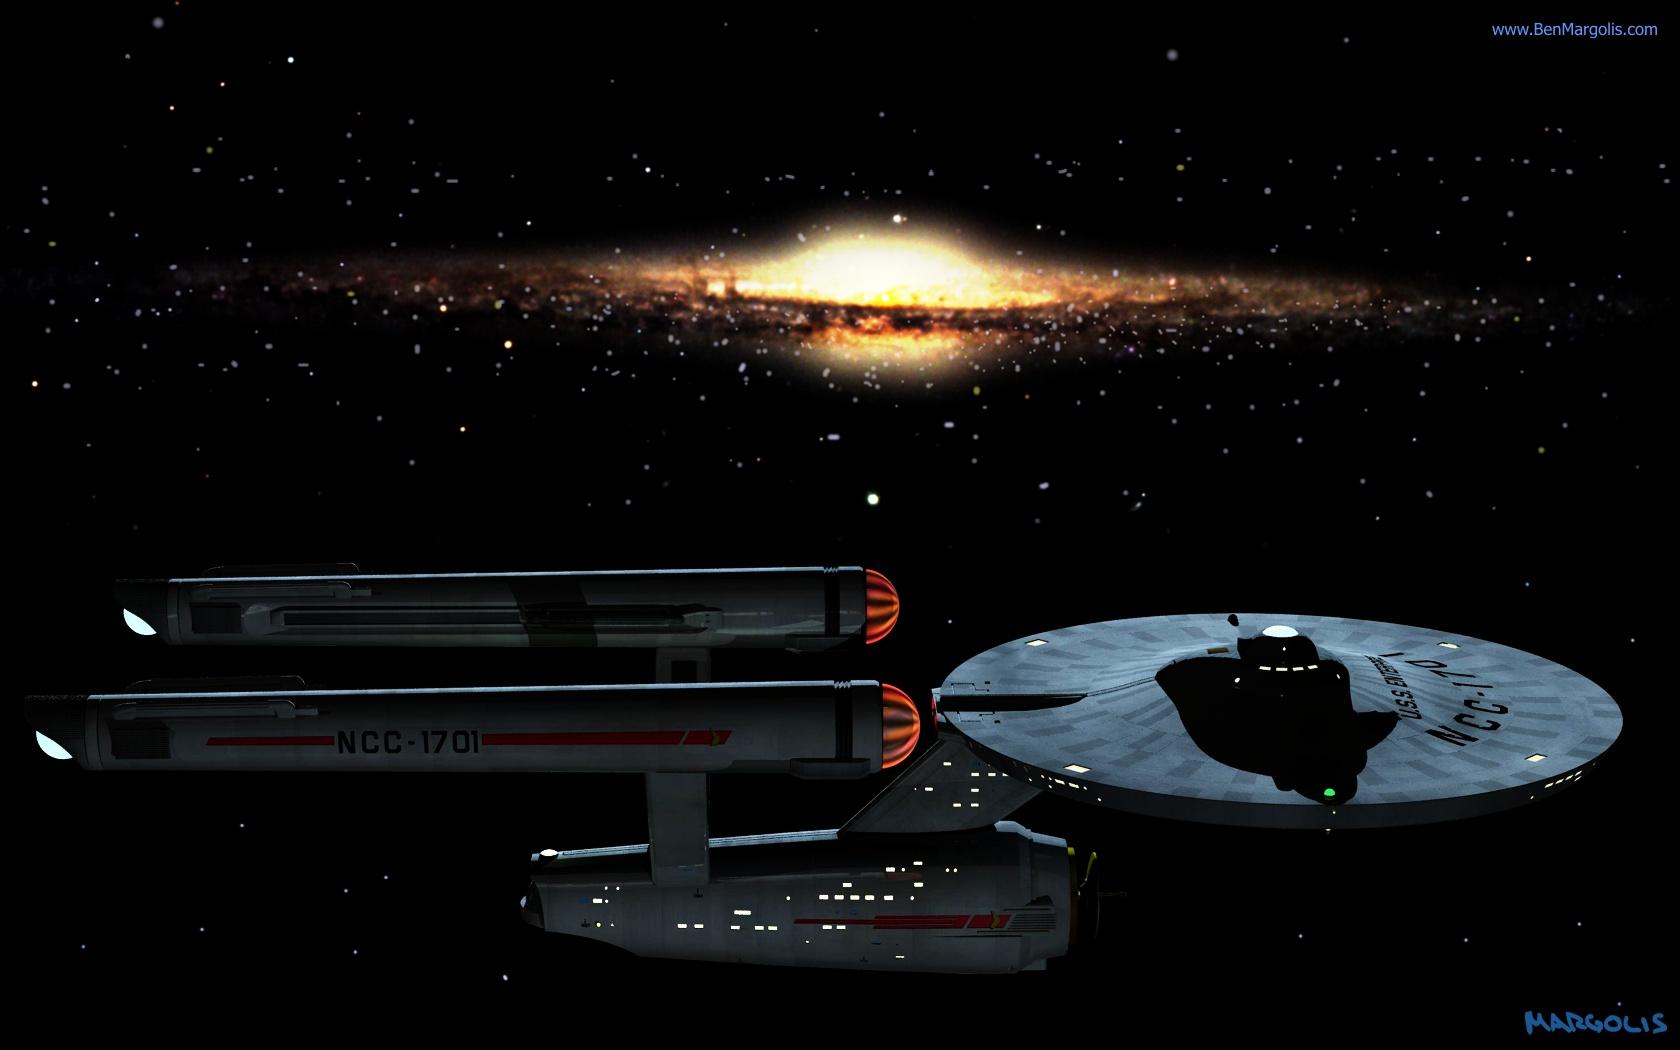 Star Trek Enterprise NCC1701 computer animated series of short films 1680x1050